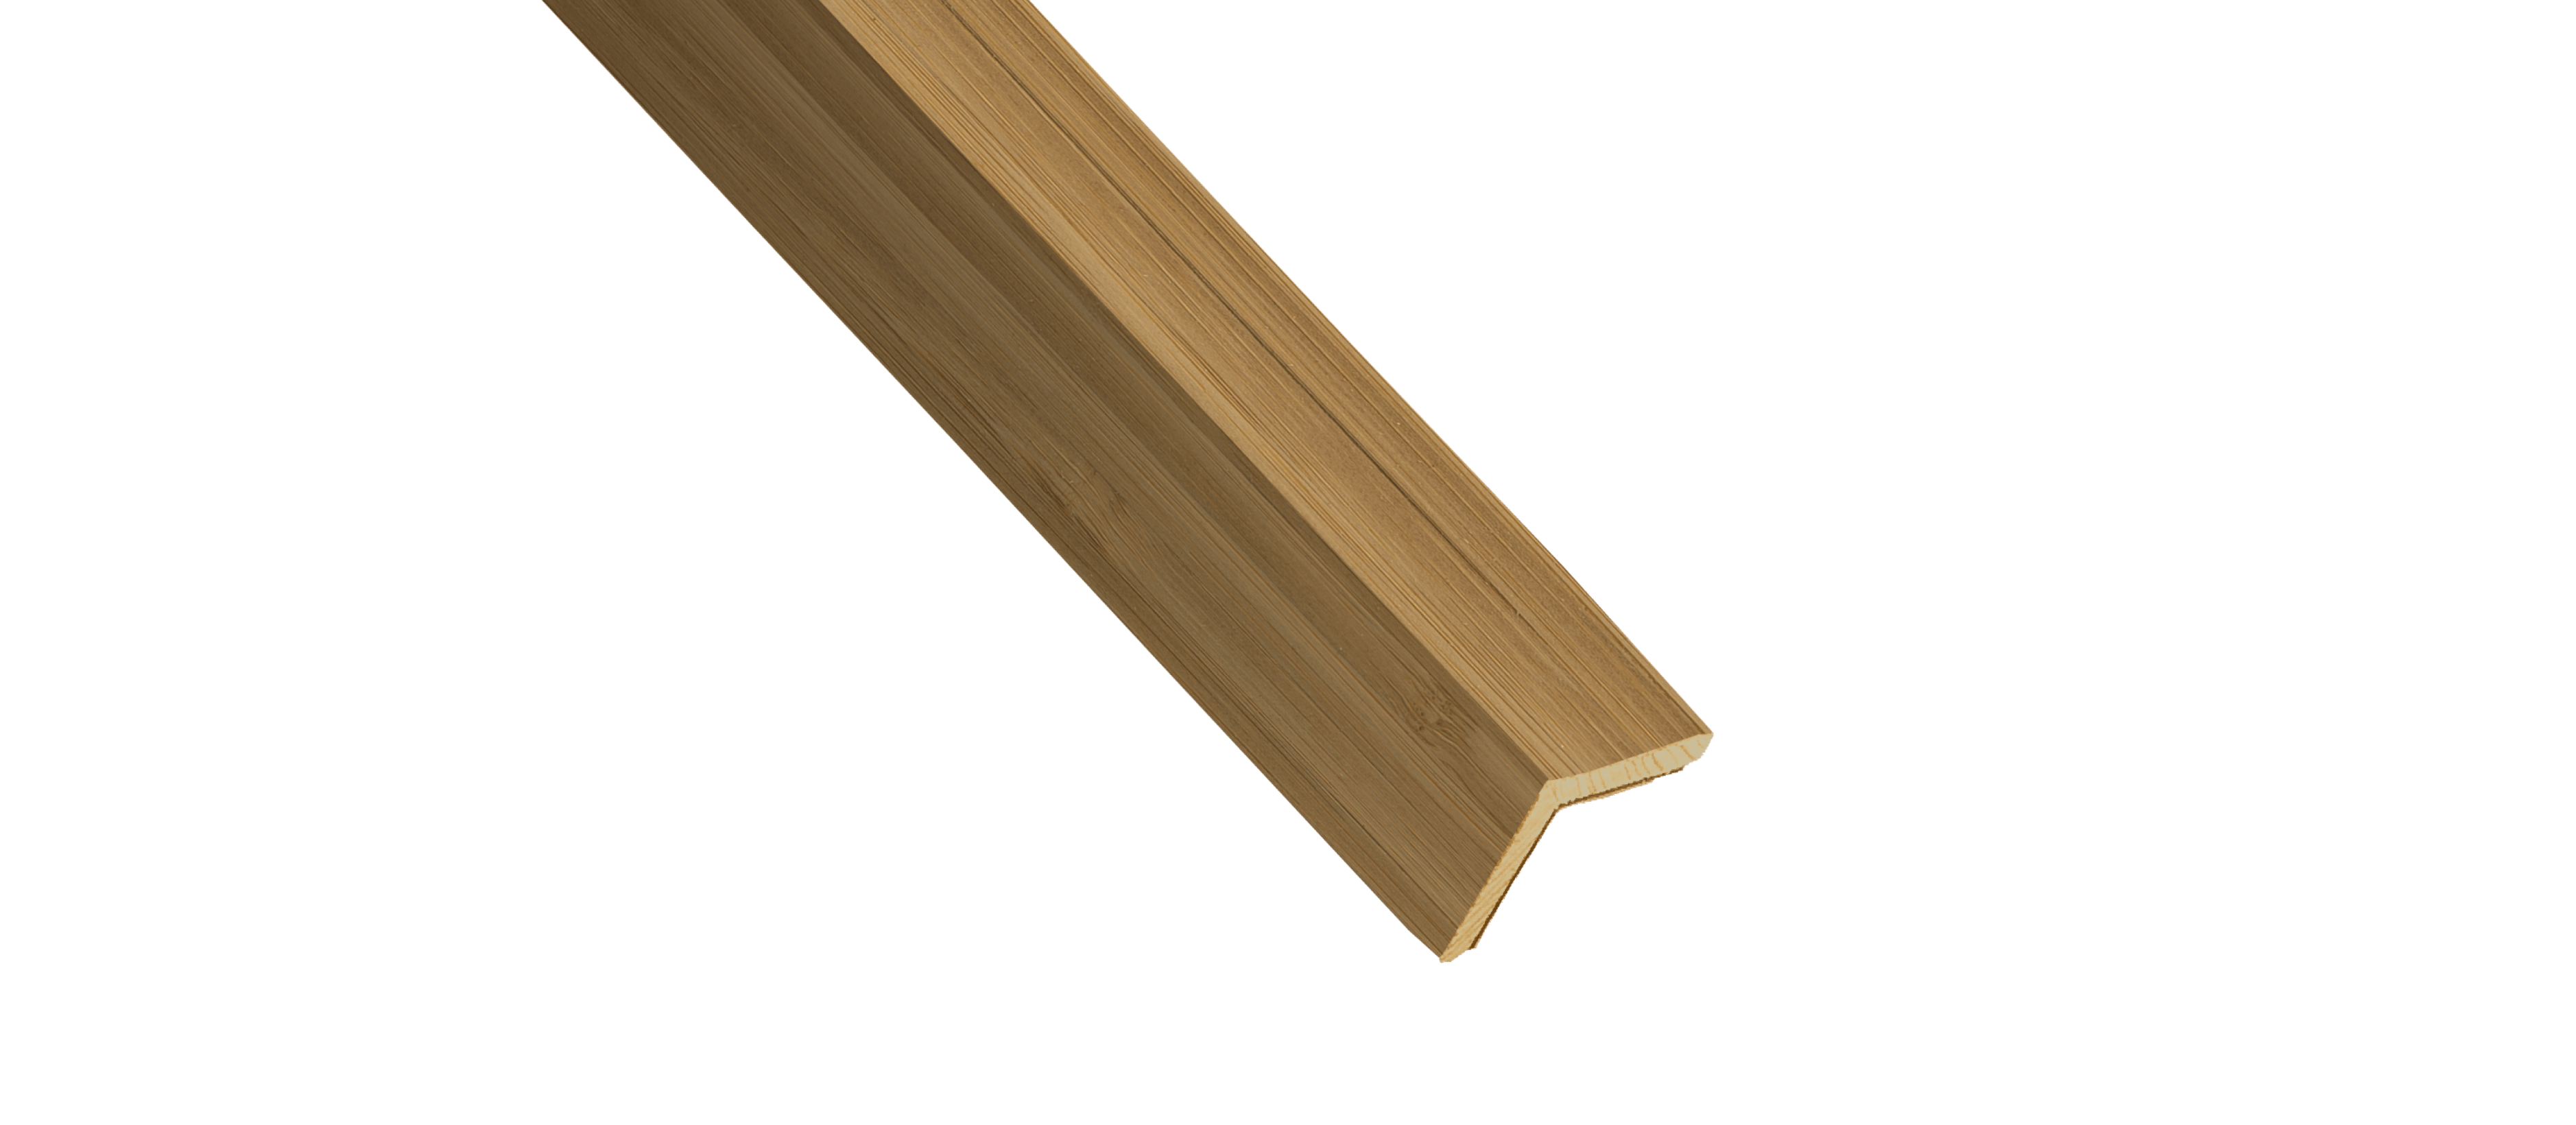 Vertical Caramelized Bamboo Wood Corner Trim Sample